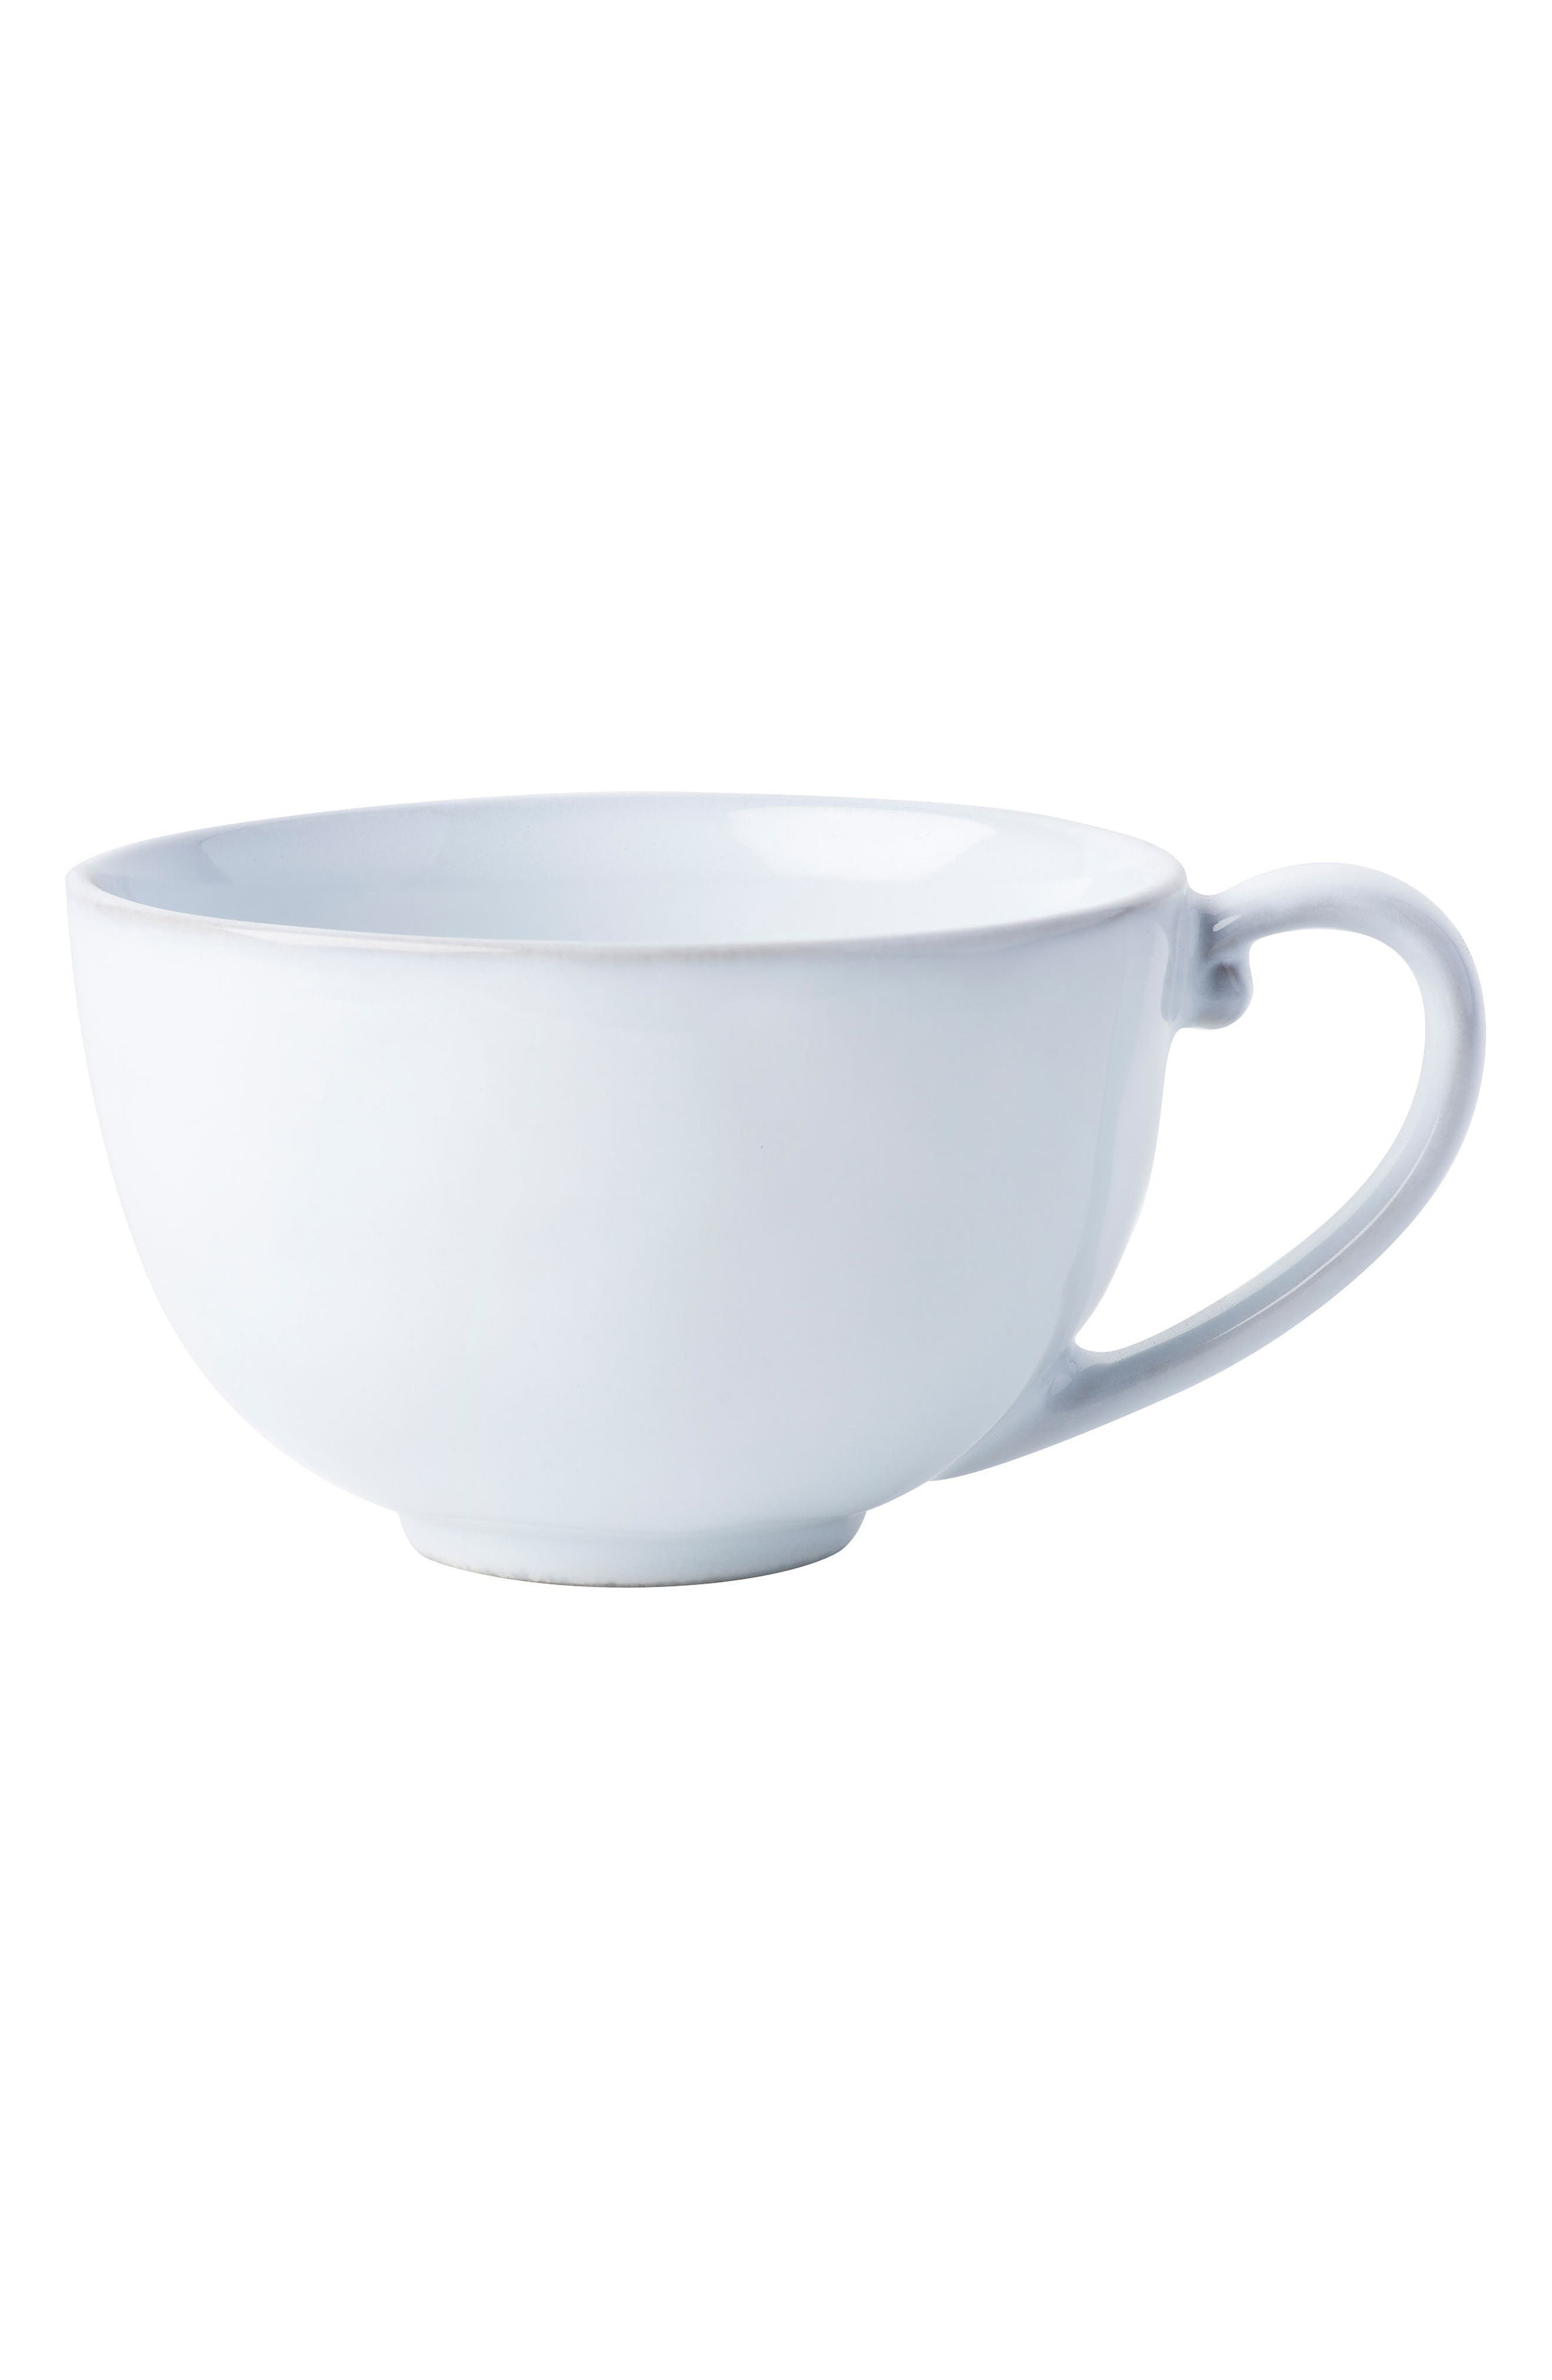 Juliska Quotidien White Truffle Ceramic Coffee Cup